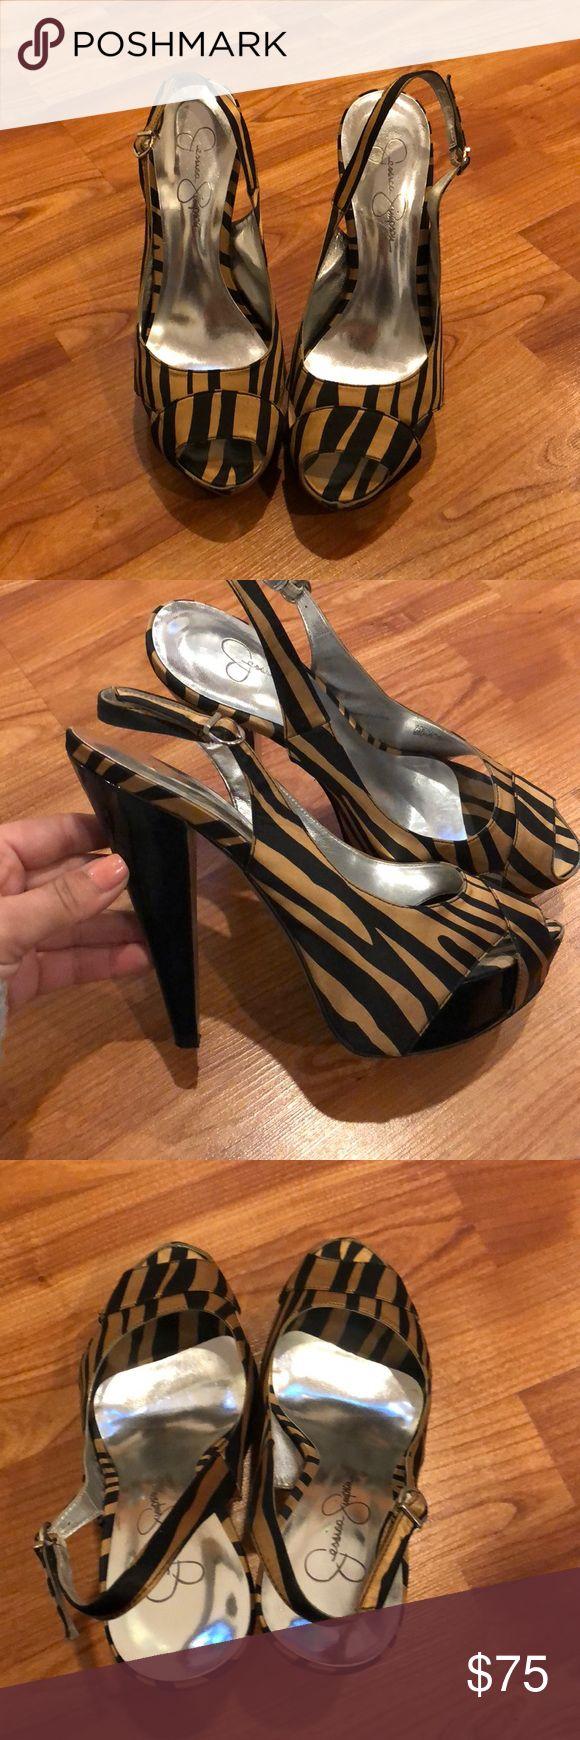 Jessica Simpson zebra heels Gold and black zebra heels with black heel. Comes with box Jessica Simpson Shoes Heels